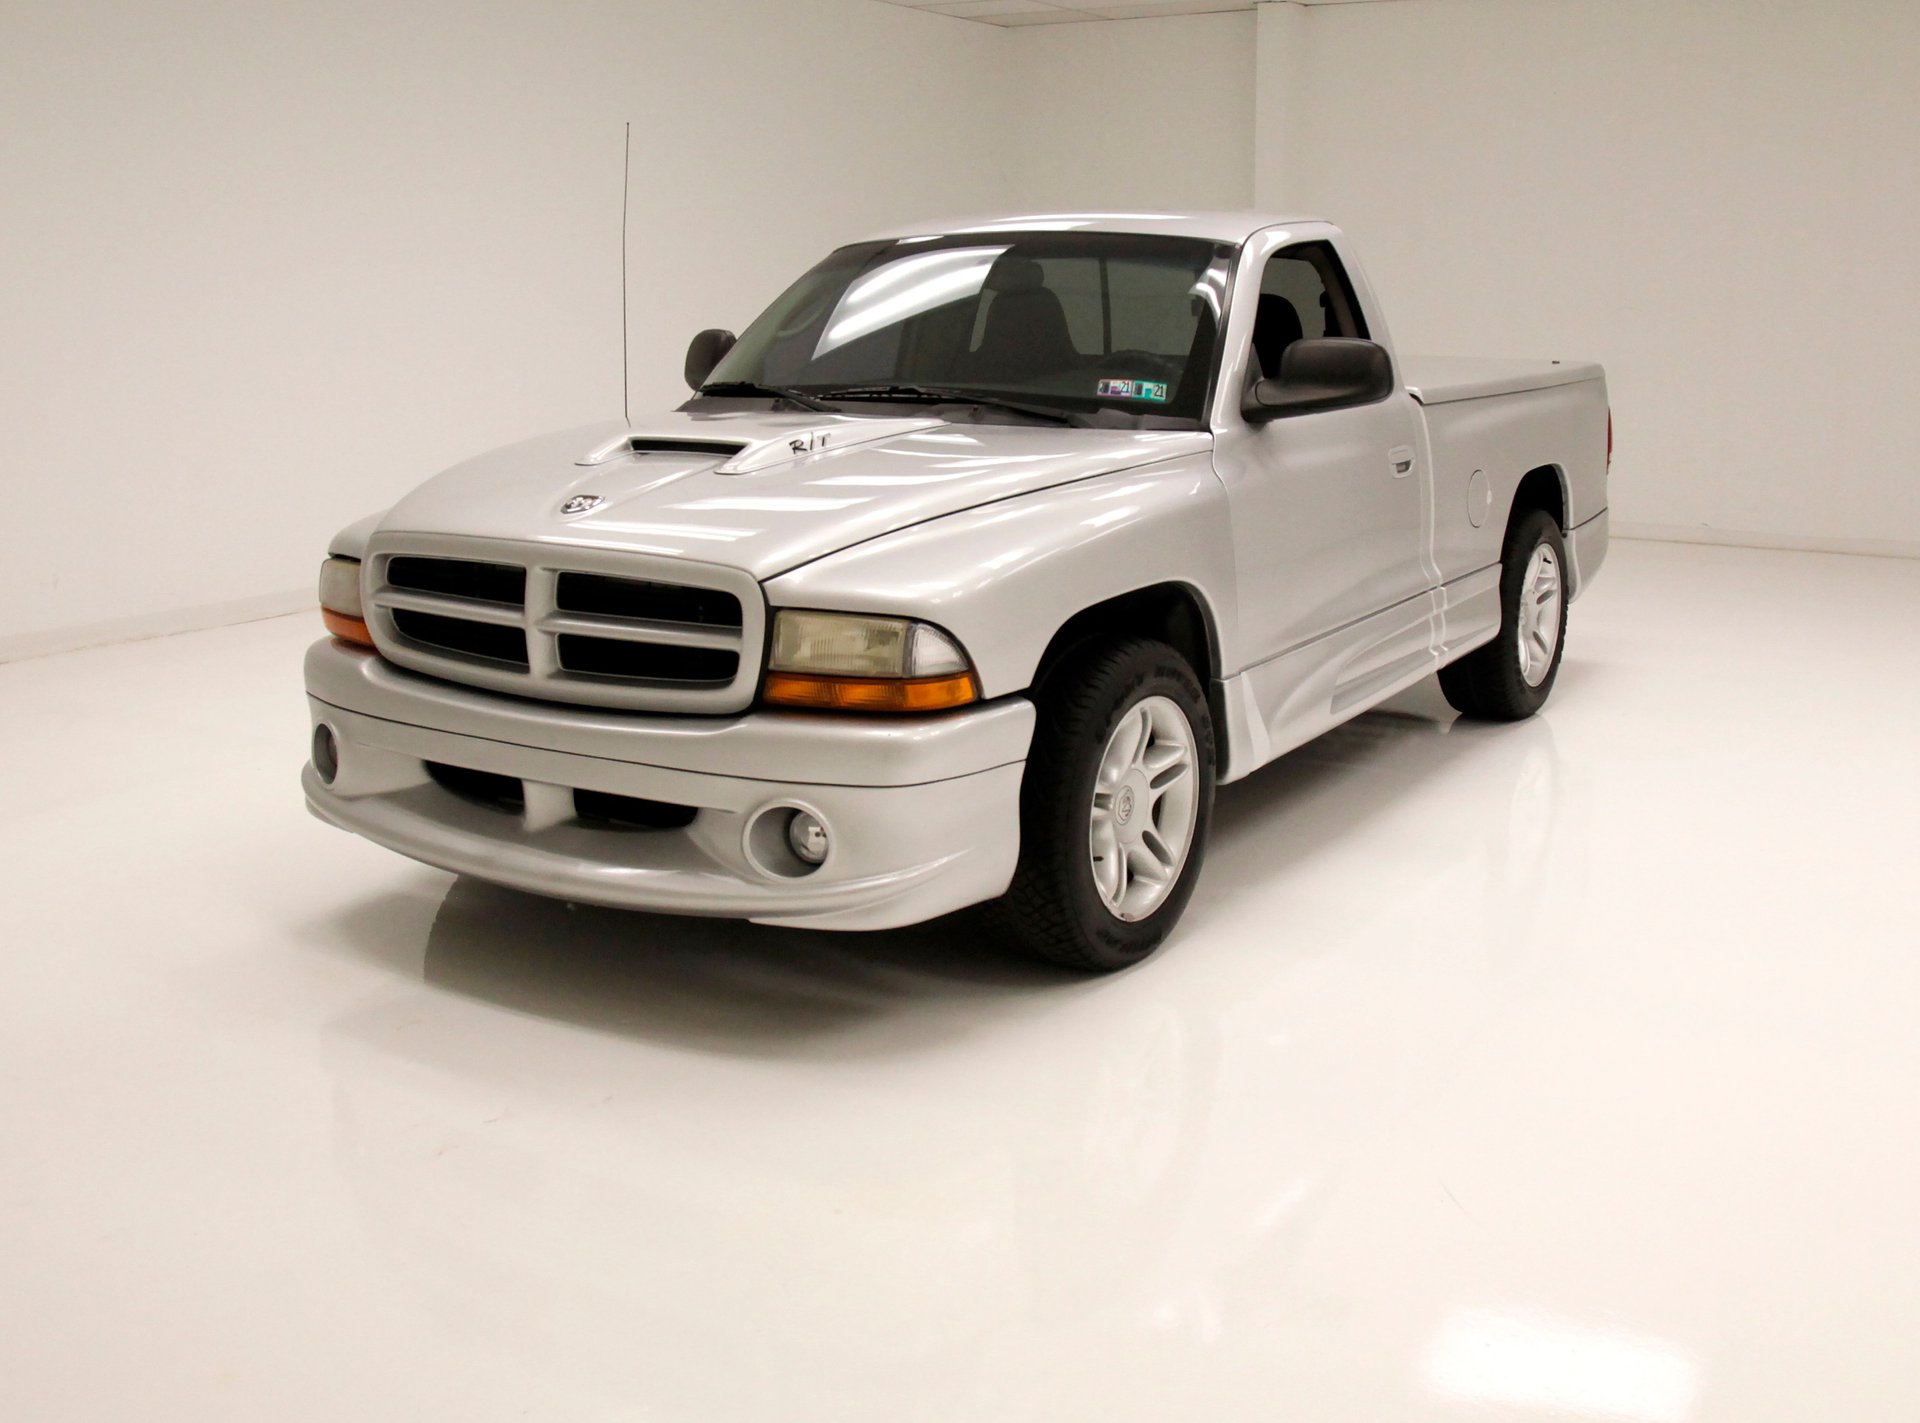 2001 Dodge Dakota RT Pickup